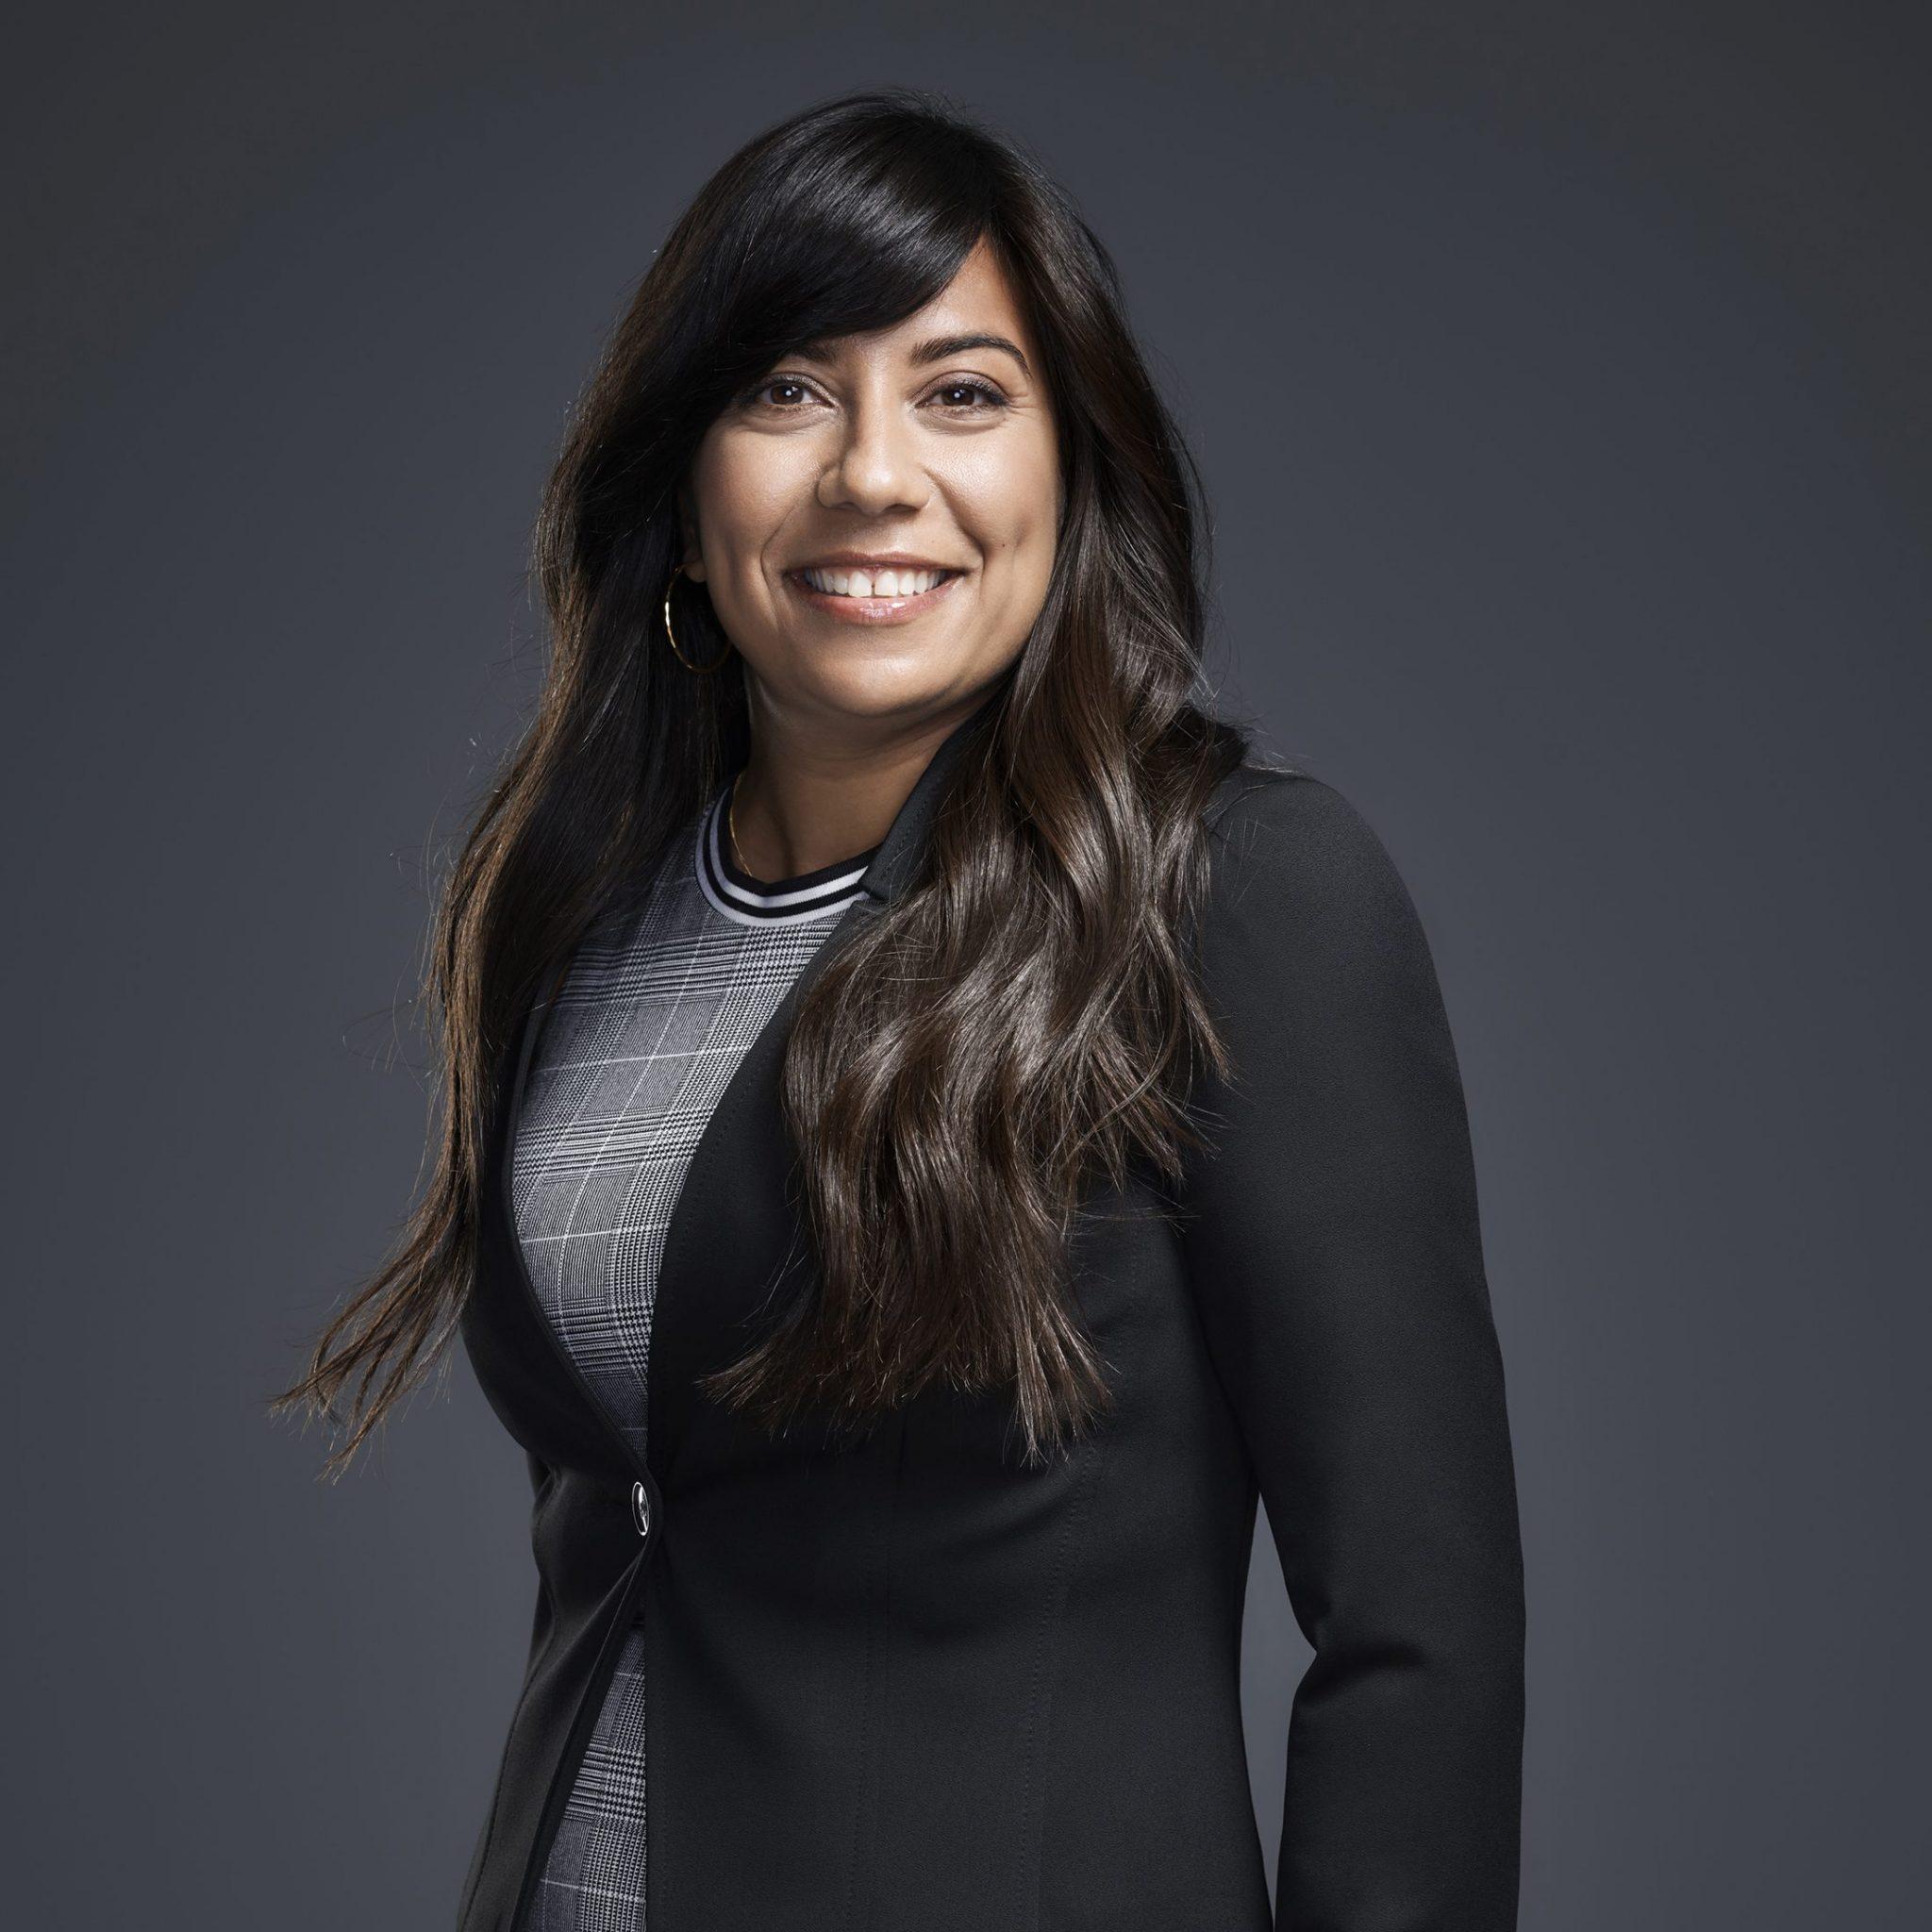 Kathy Baig, Eng., FIC, MBA